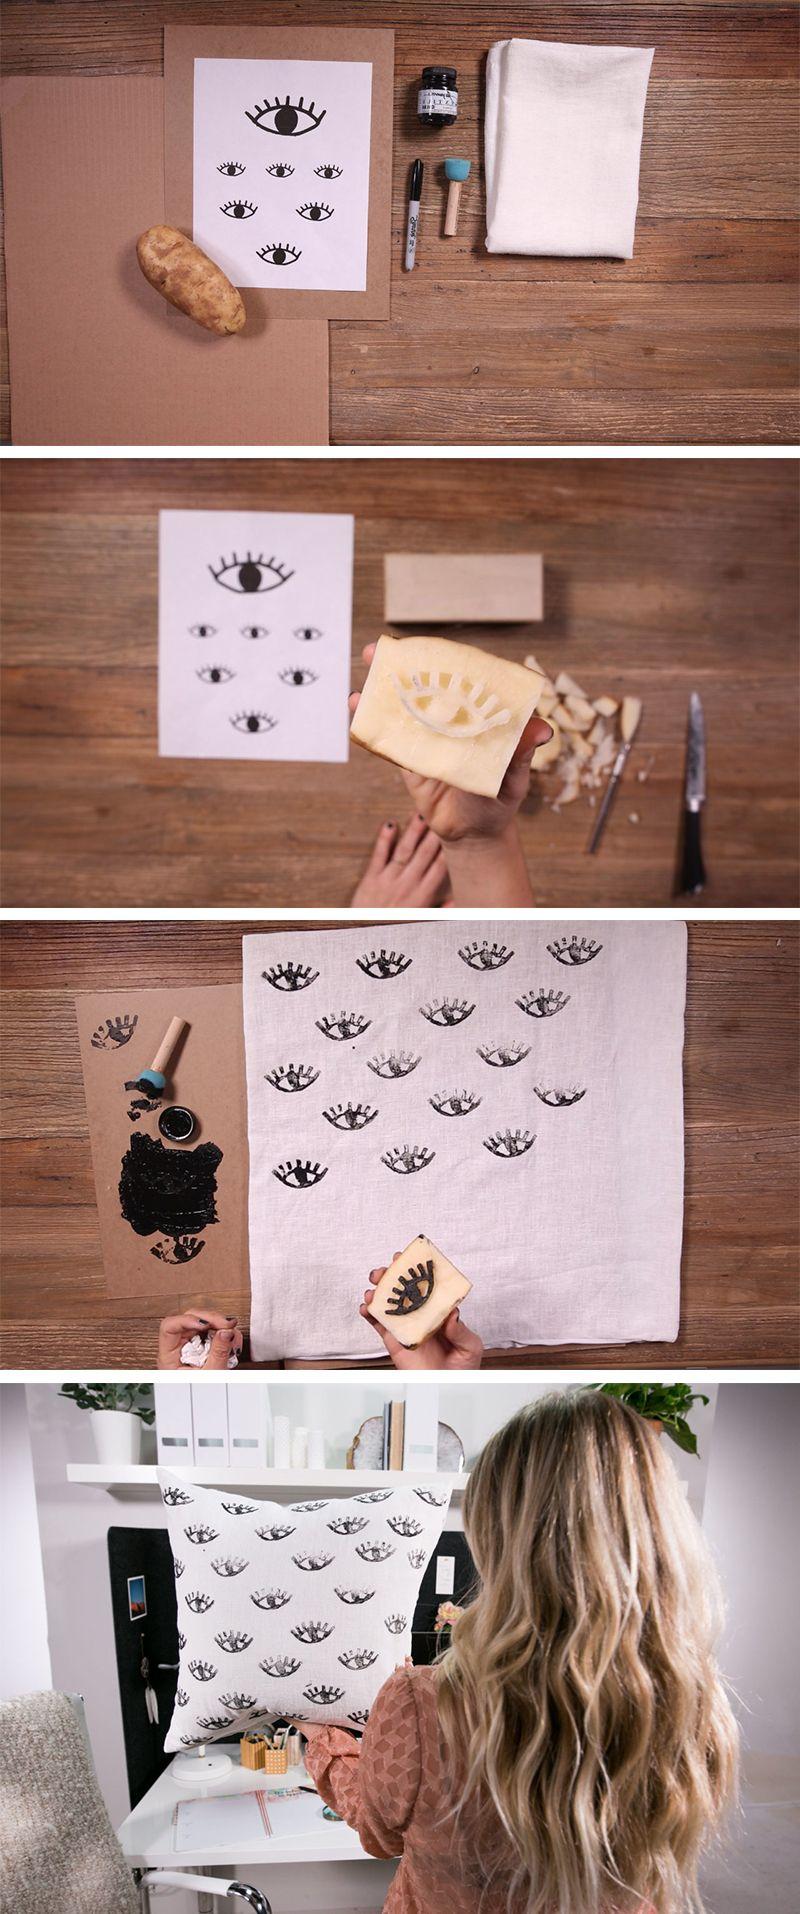 diy potato stamped eye print pillow mr kate diy pinterest stempel diy inspiration und. Black Bedroom Furniture Sets. Home Design Ideas